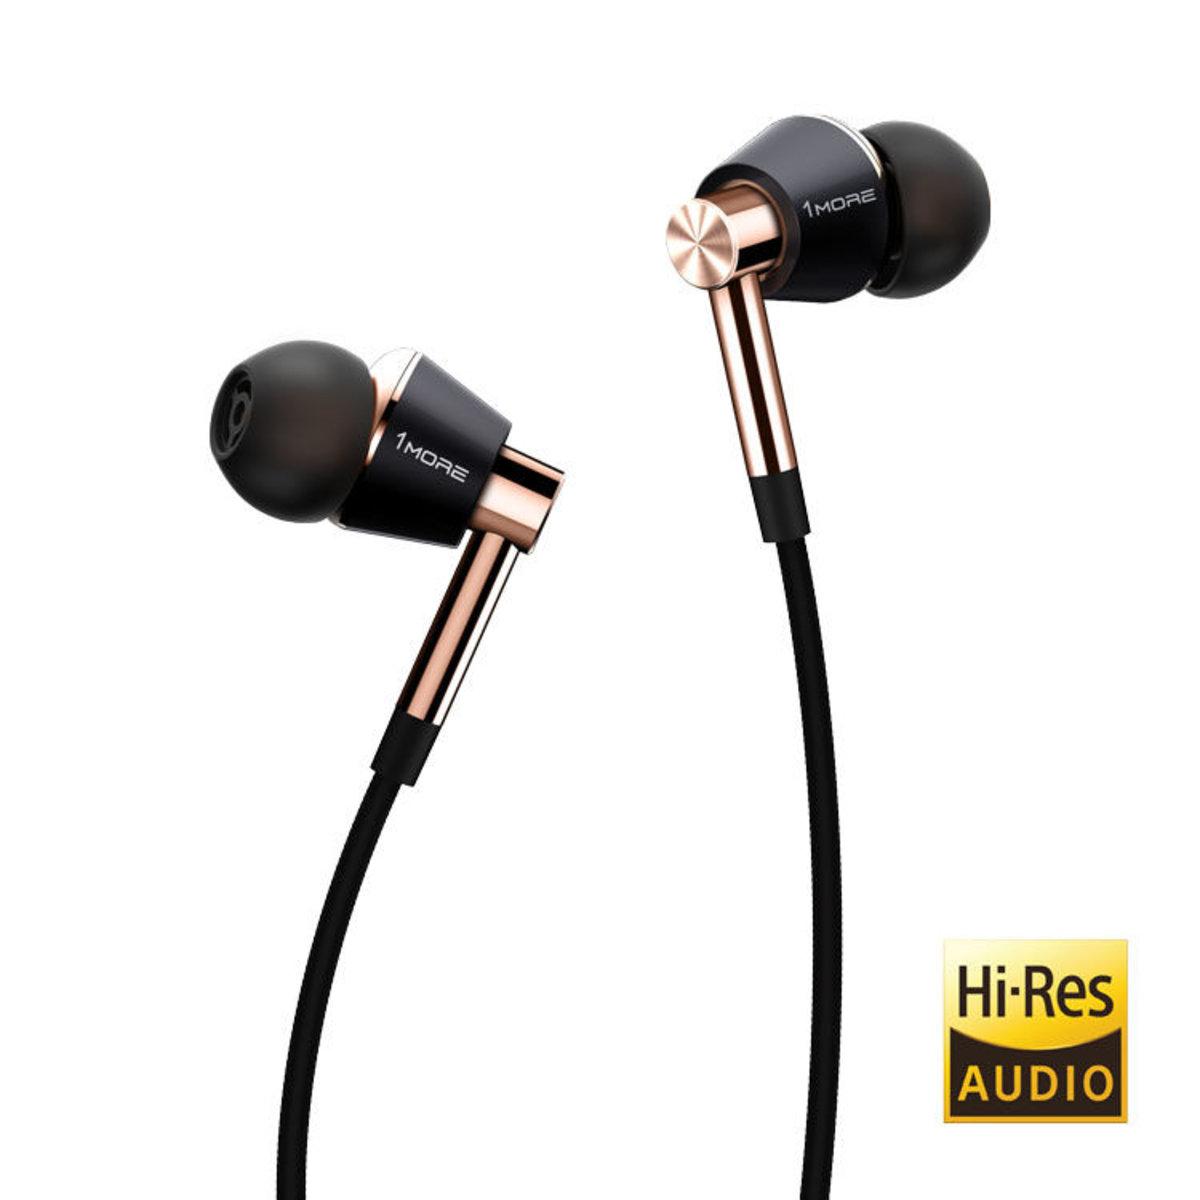 E1001 Triple-Driver In-Ear Headphones - Black/Gold